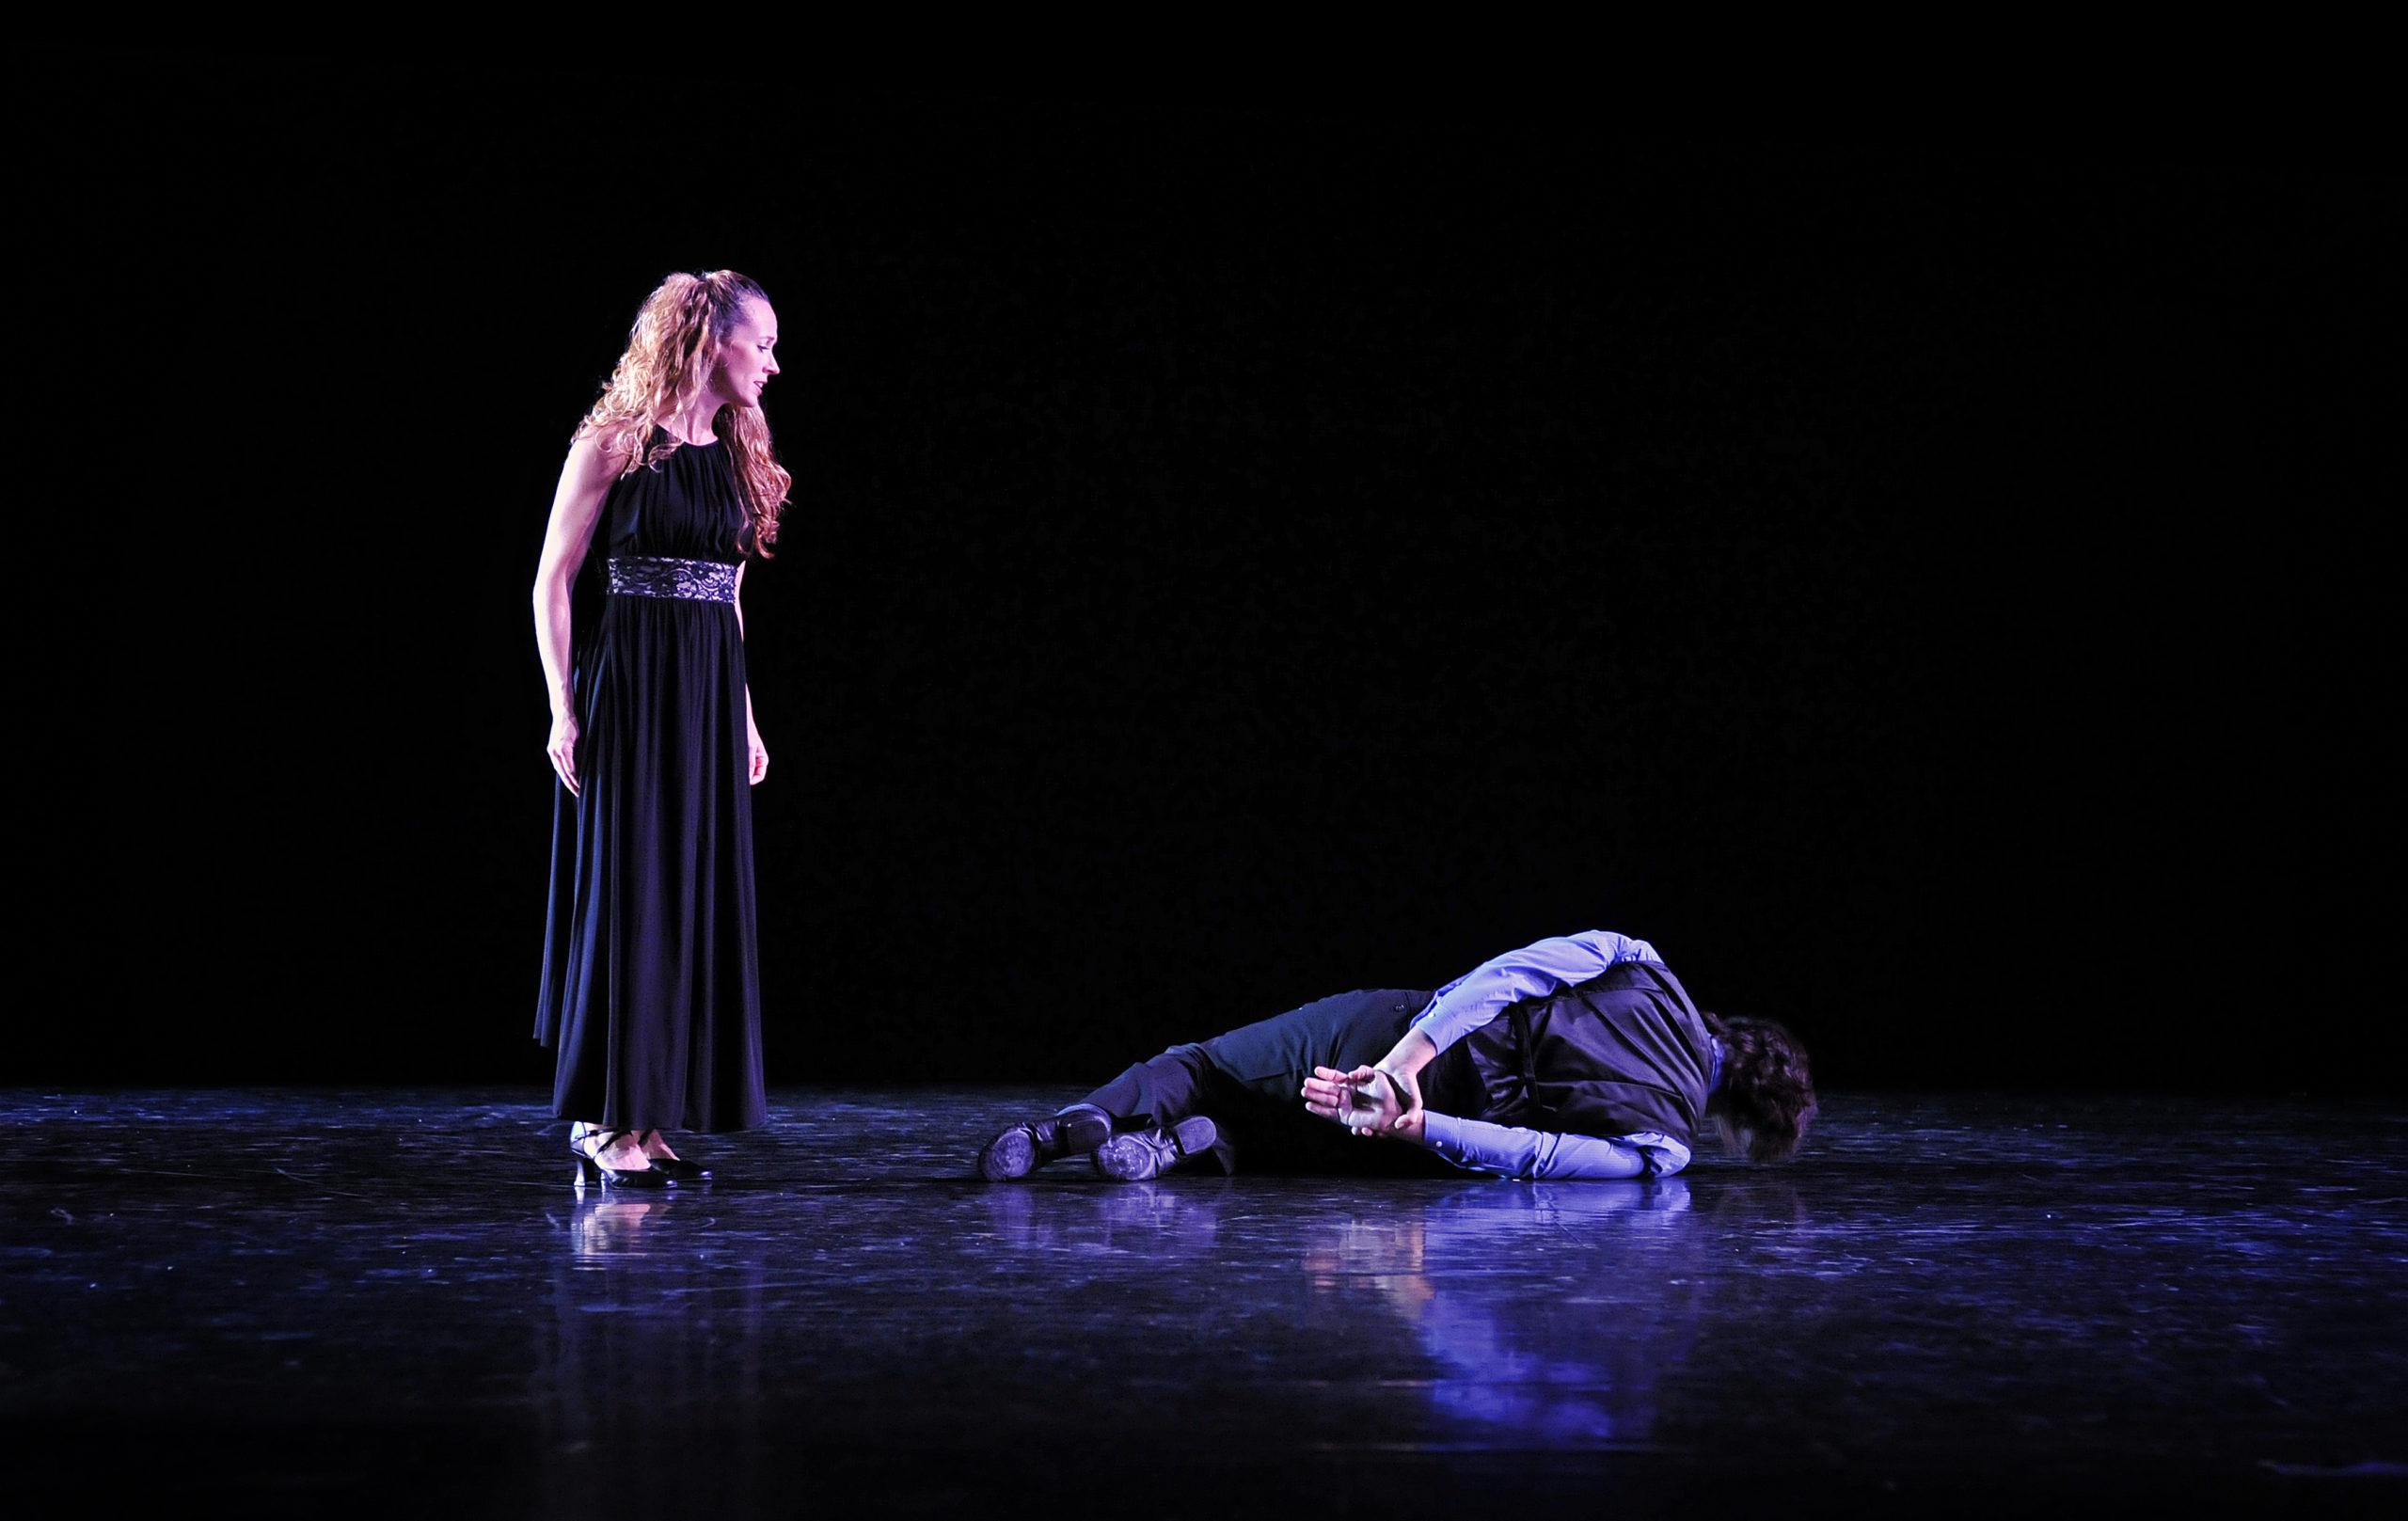 Professor Writes 'Sentences' of Movement to Bring Dances to Life